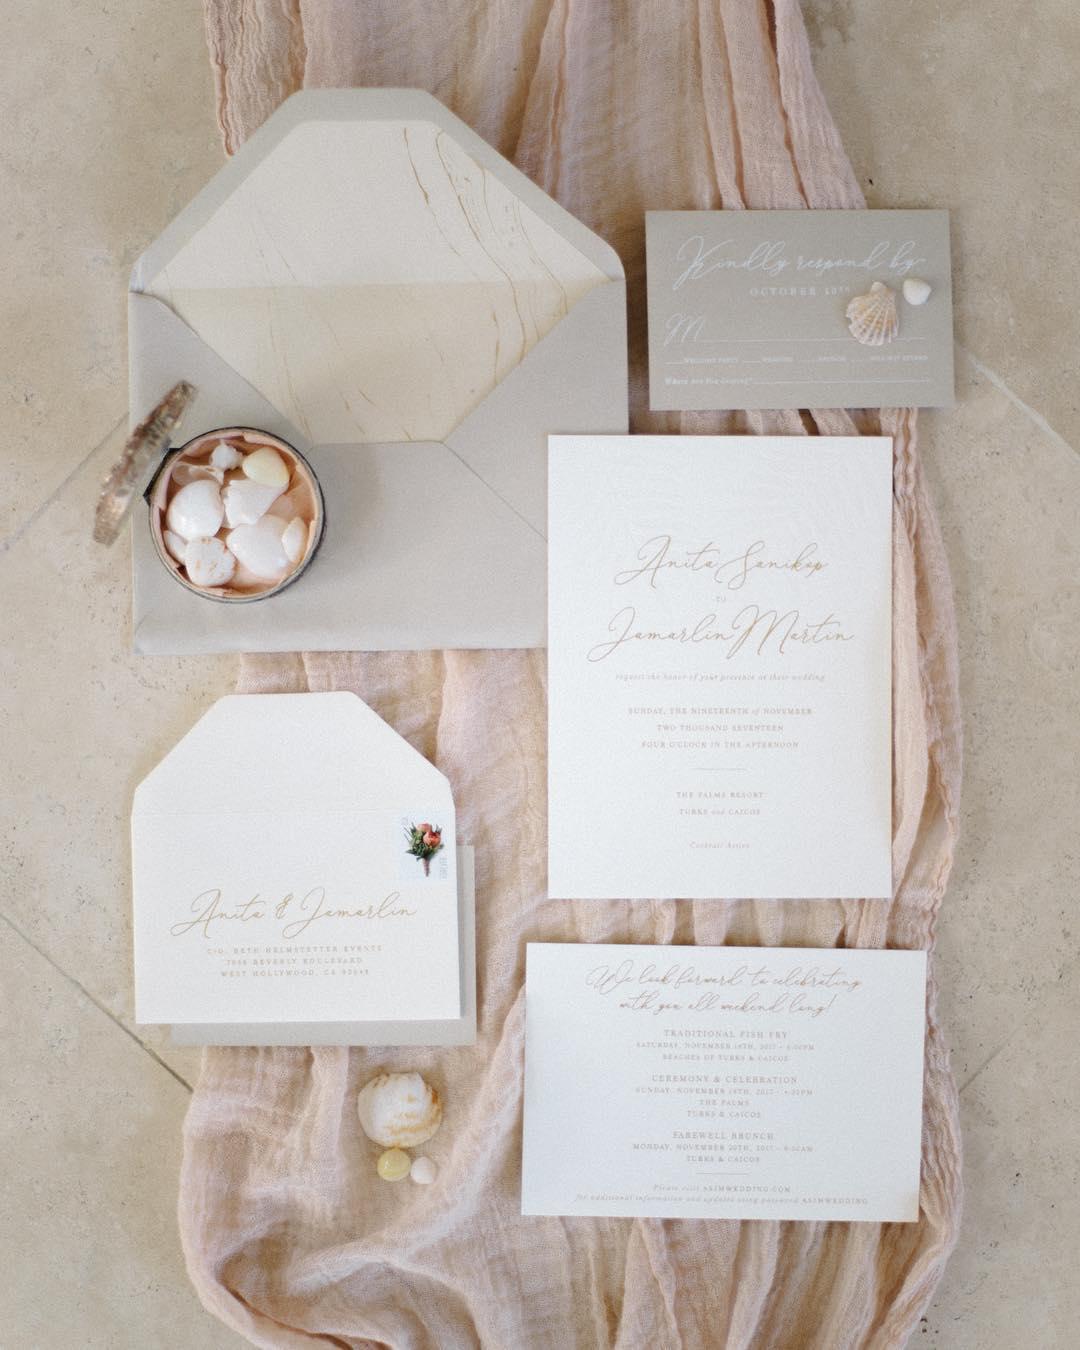 Beth Helmstetter Events - Wedding Hub - 05